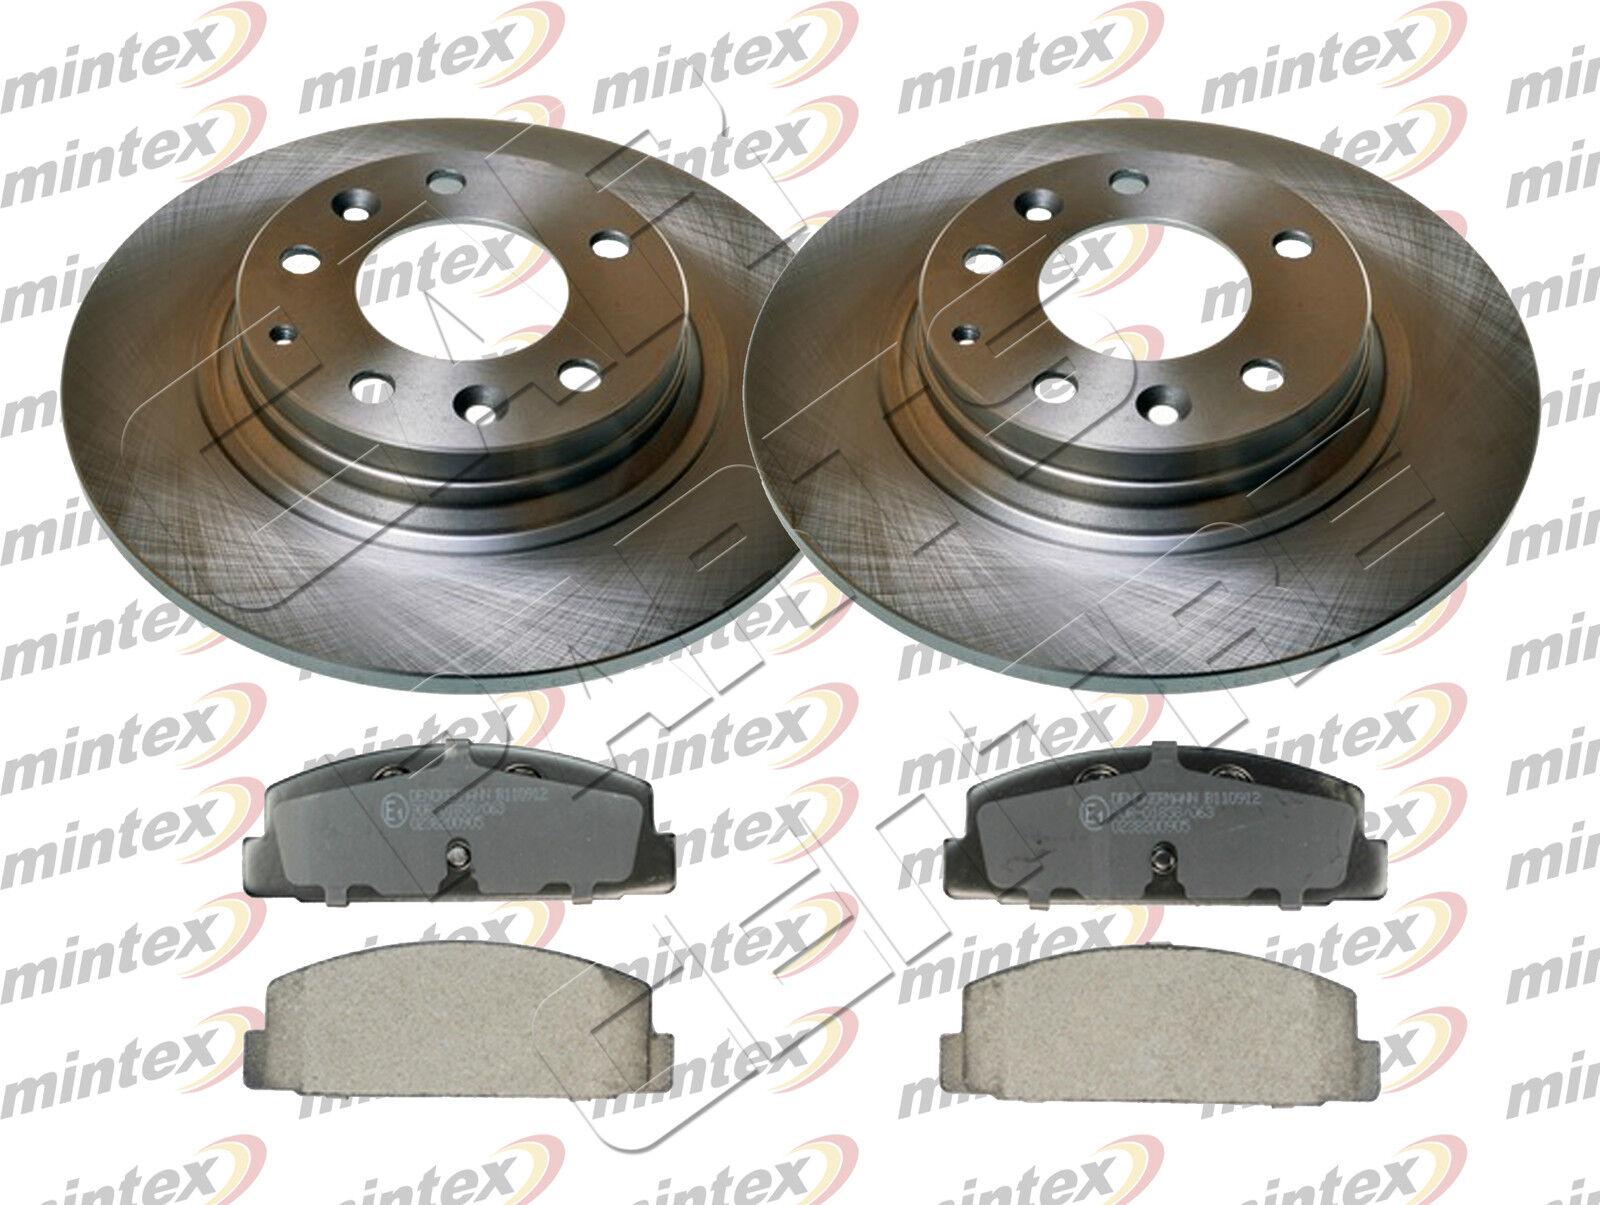 VOLVO S40 2004-/> MINTEX REAR BRAKE DISCS280MM /& PADS